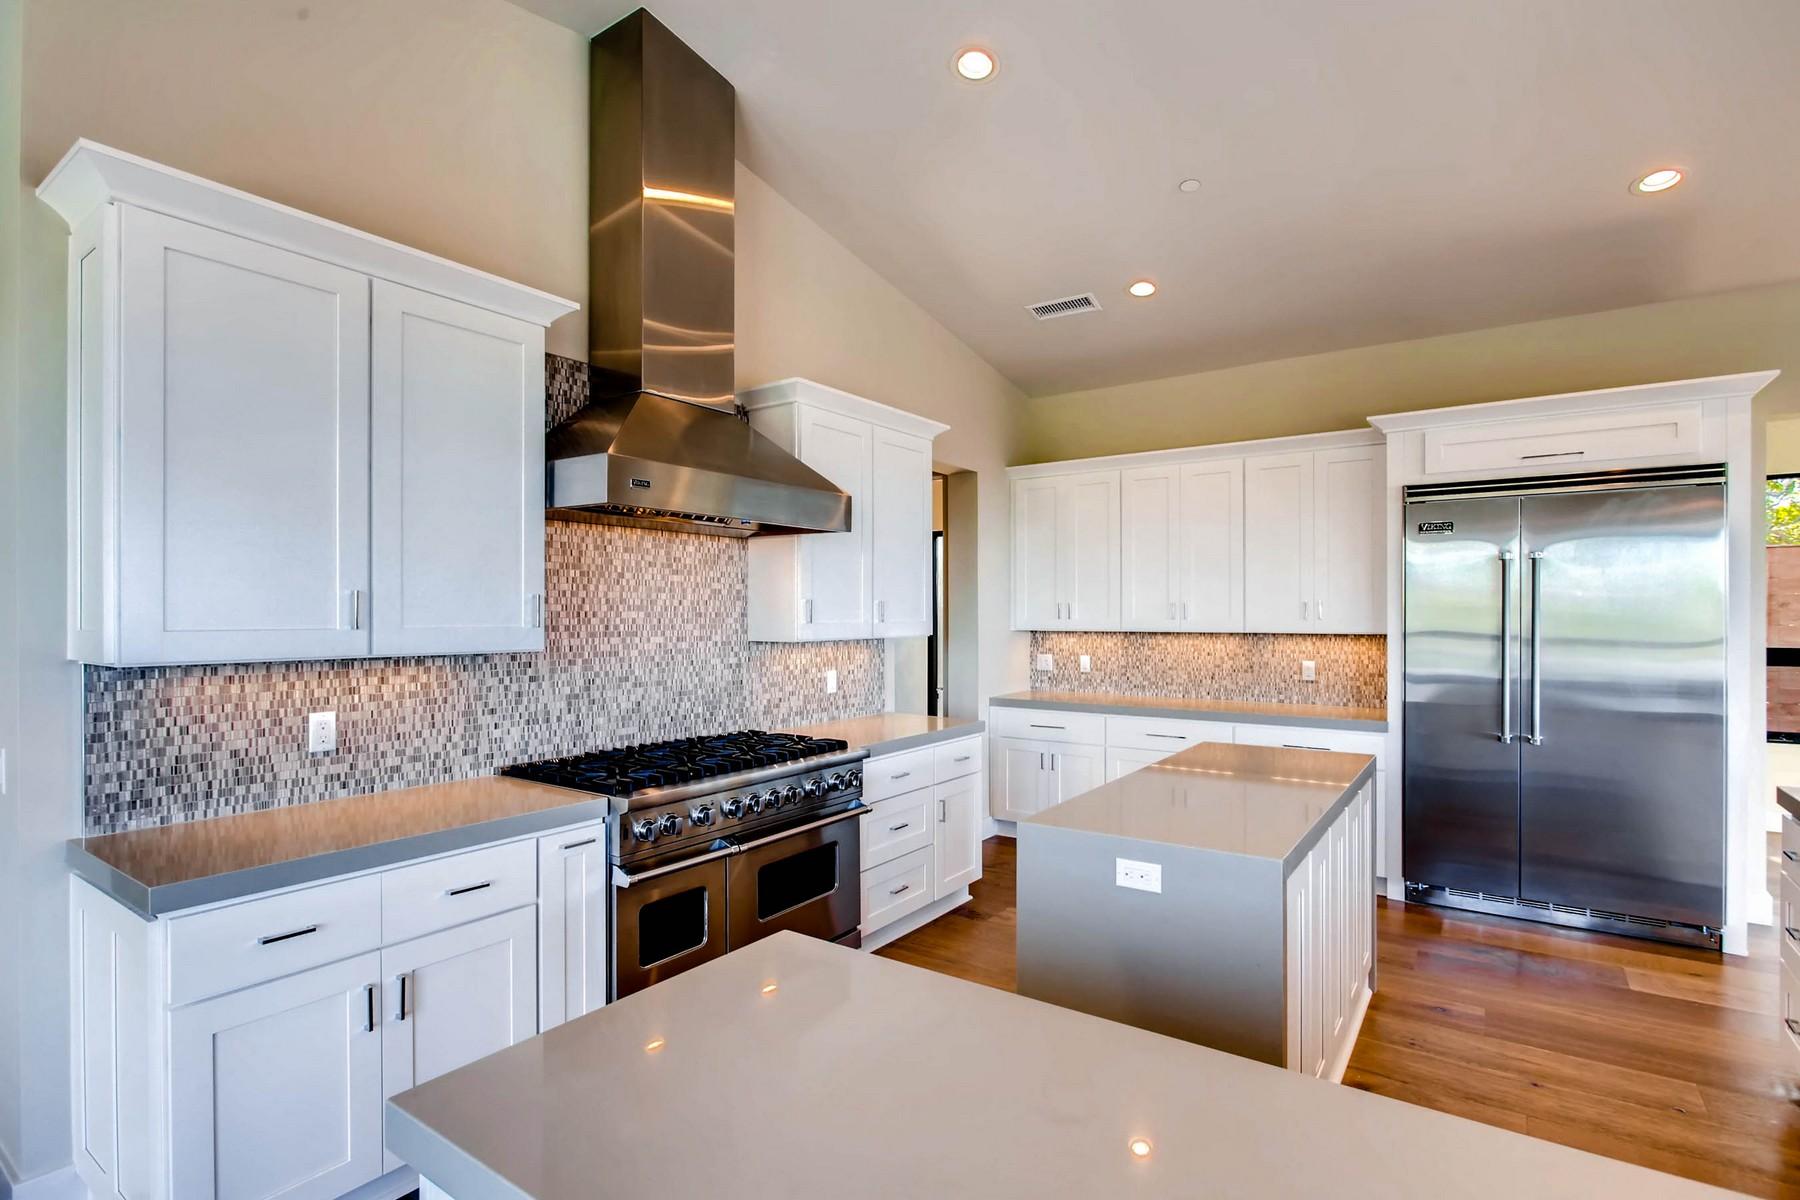 Additional photo for property listing at 1222 Muirlands Vista Way  拉荷亚, 加利福尼亚州 92037 美国